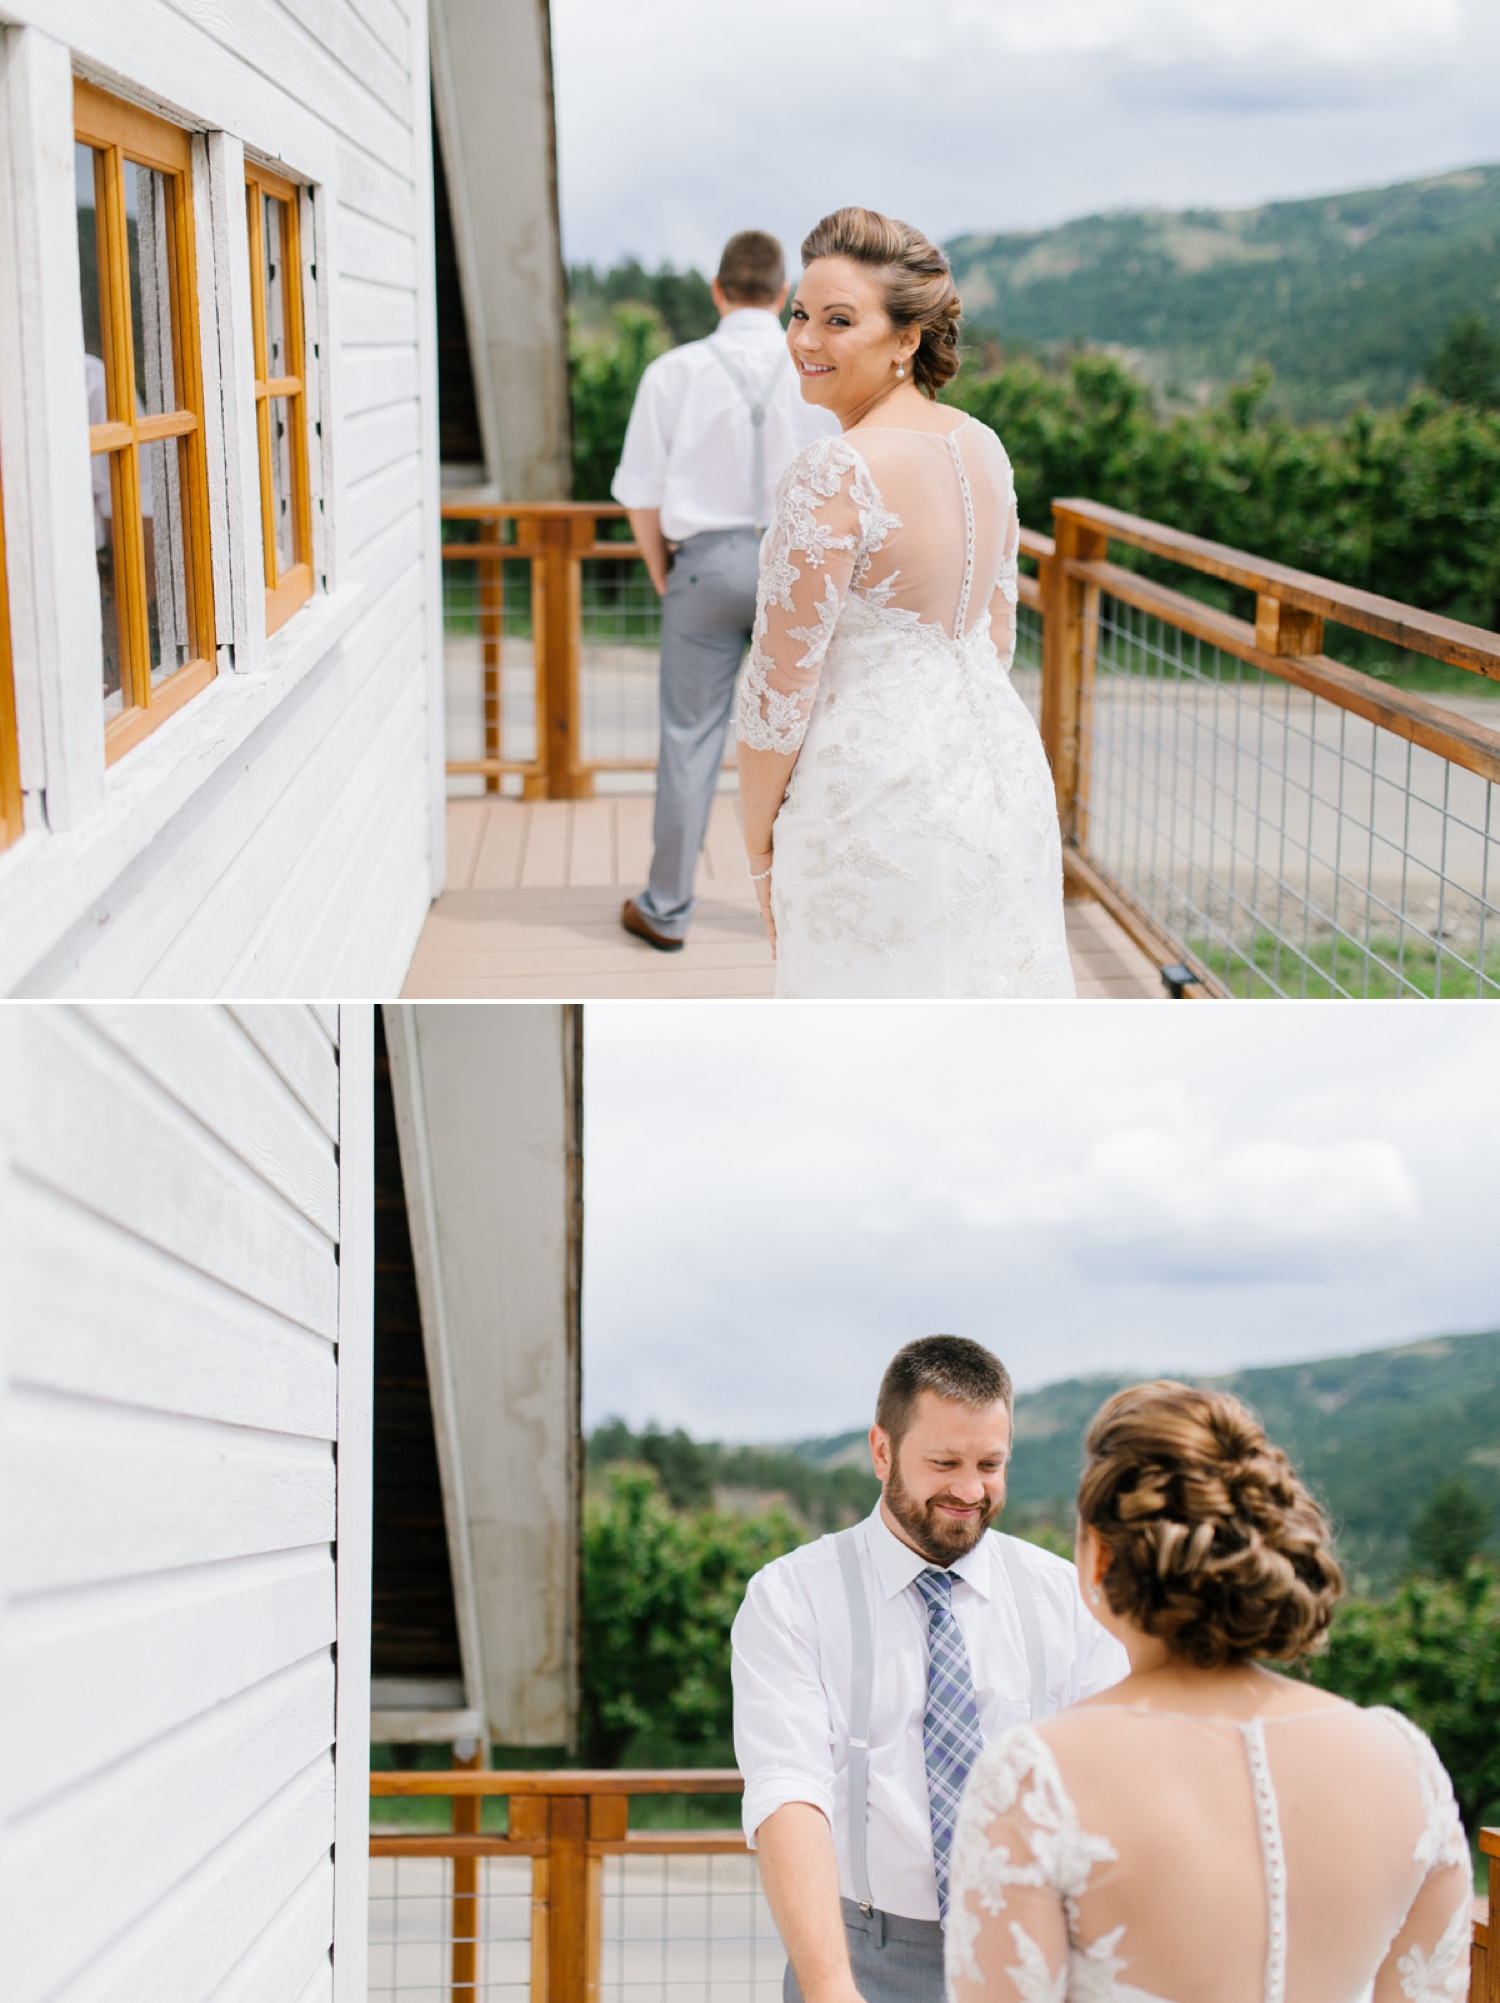 Wenatchee Wedding Photographer   Hampton Hideaway   Summer Rustic Wedding Eastern Washington   Emma Rose Company   Pastel Wedding Inspiration   Lace Wedding   Pacific Northwest Wedding 21.jpg